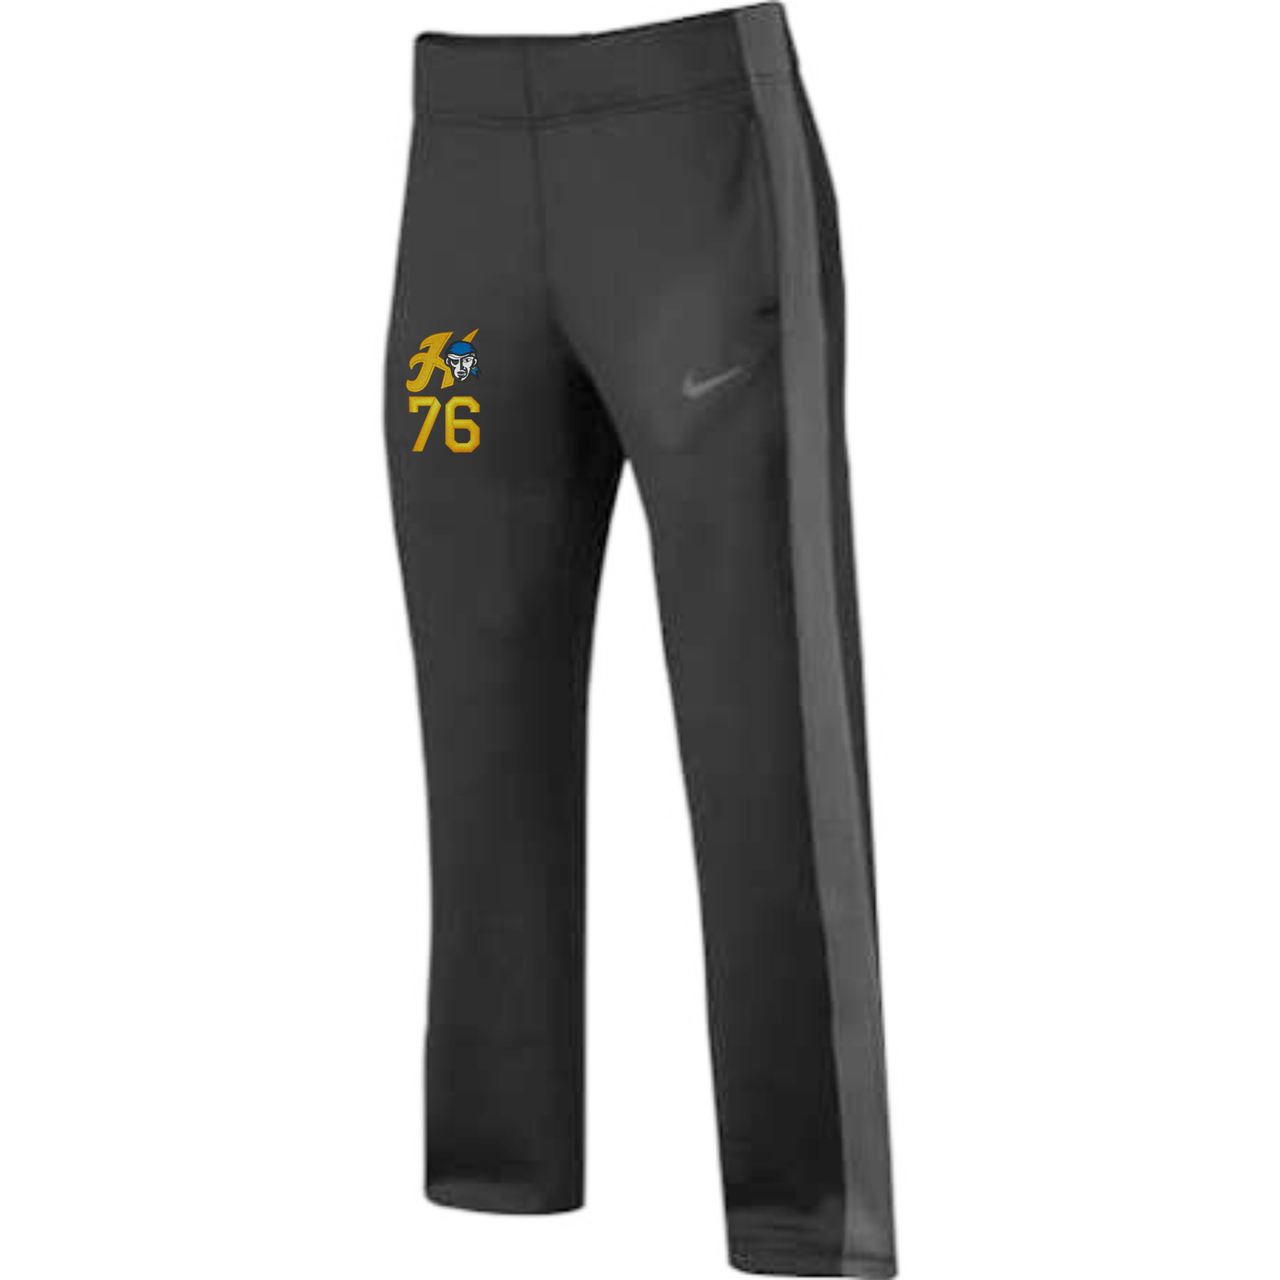 Nike Team KO Pants Men's (for players)